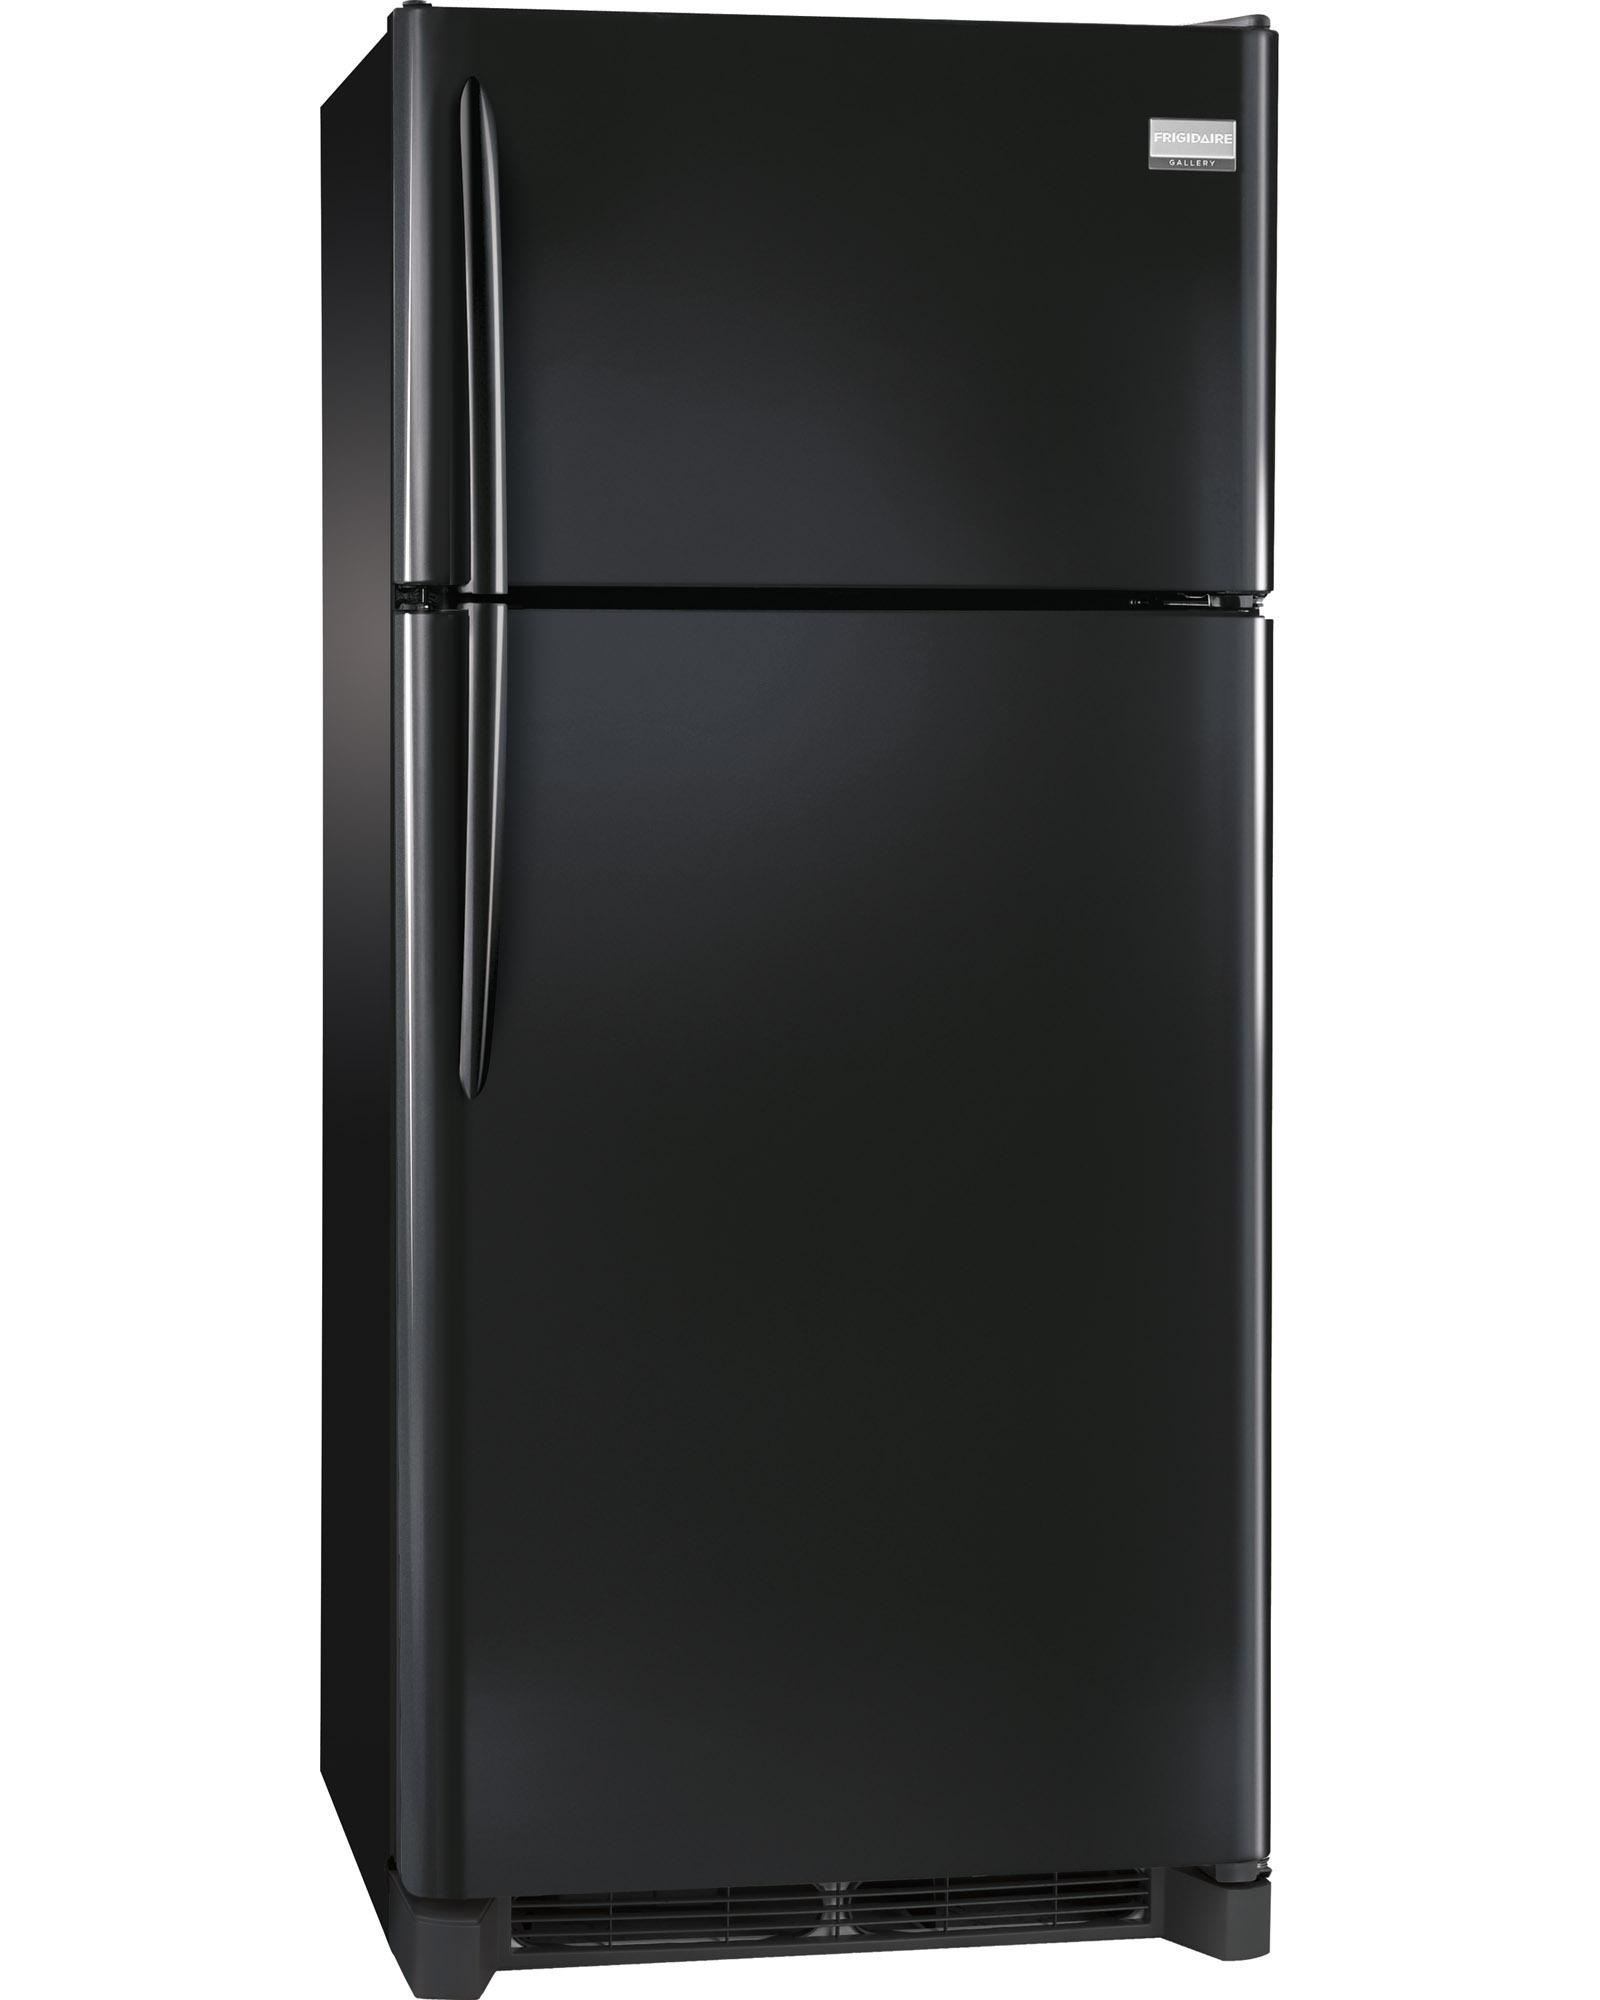 Frigidaire Gallery FGHI1864QE 18.3 cu. ft. Top Freezer Refrigerator - Black